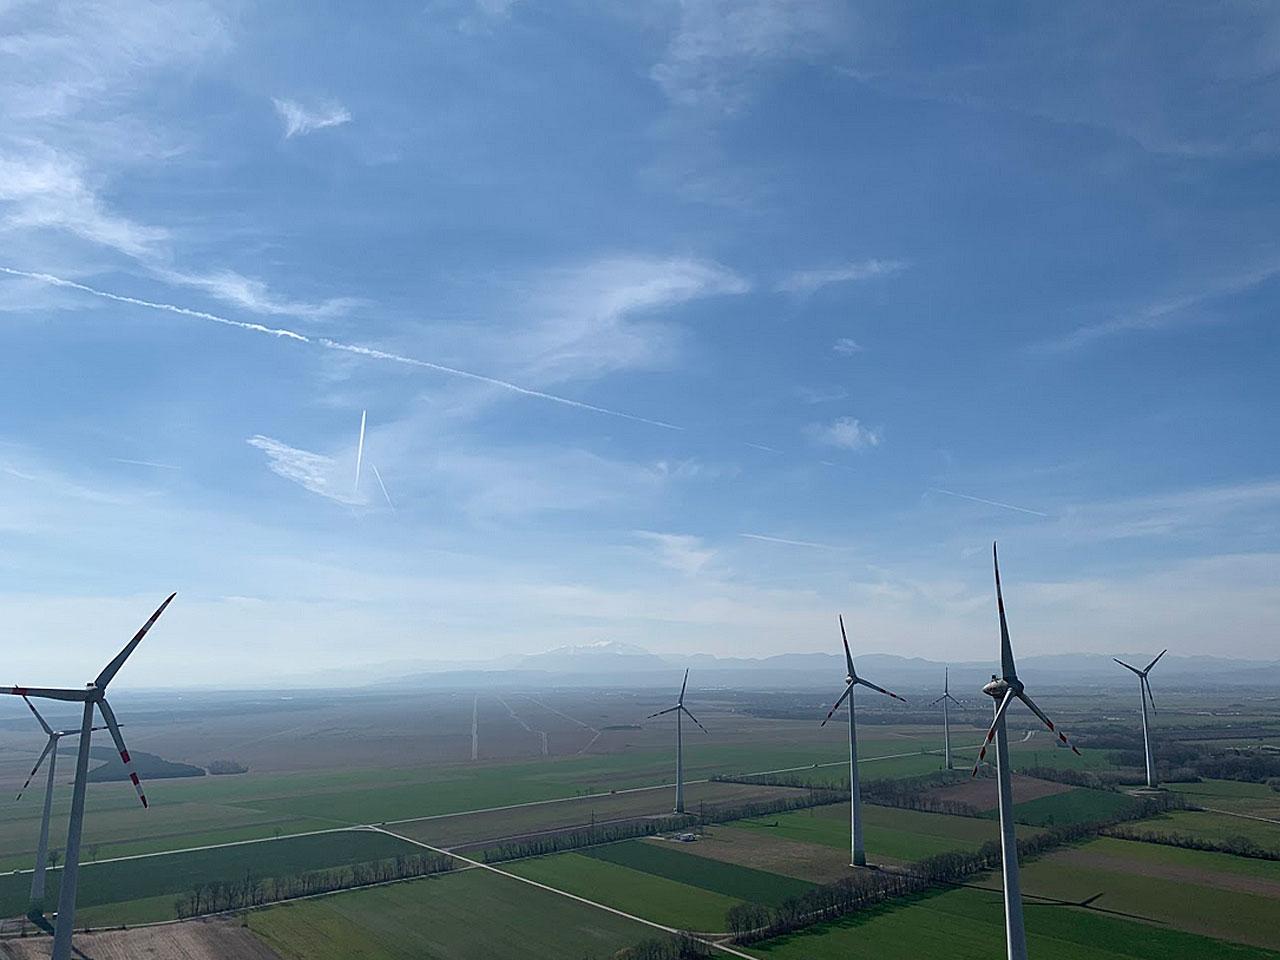 Windkraftanlage  Fotocredit: Energieleben Redaktion